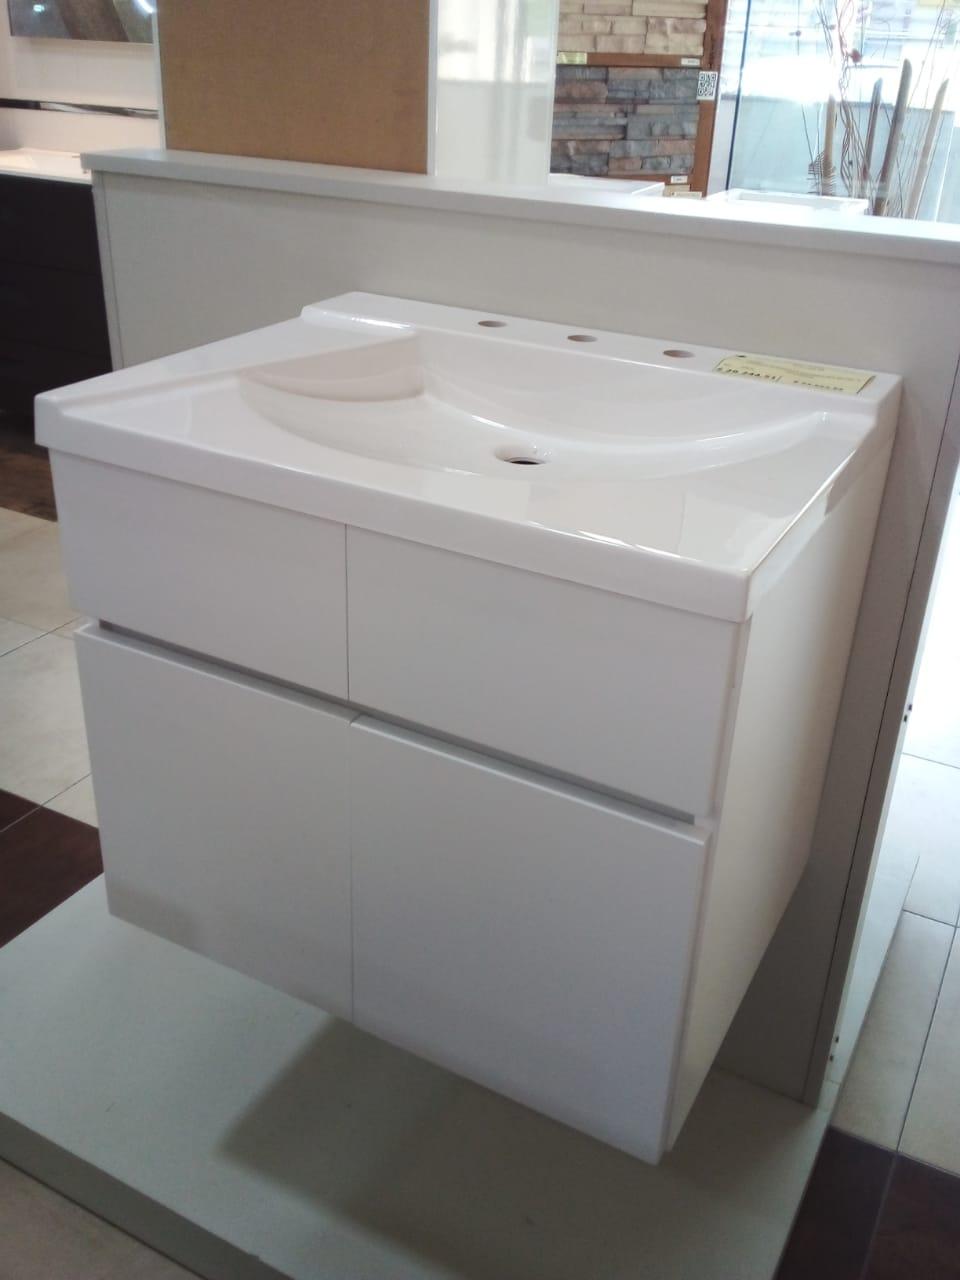 Vanitory Schneider Atenas Colgante 60 cm Blanco